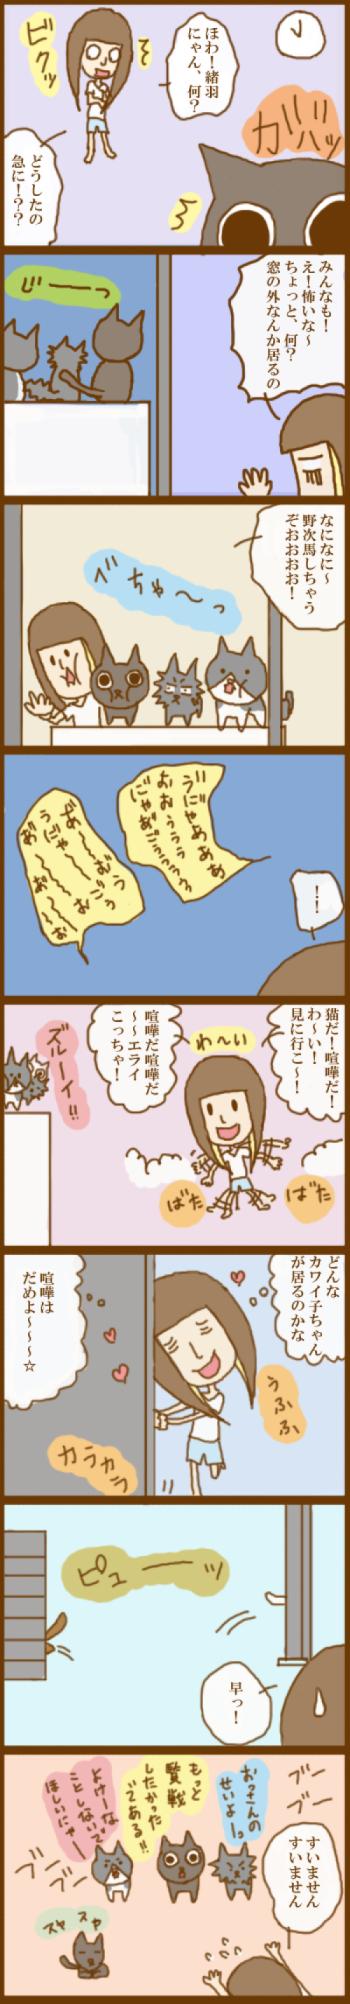 f:id:suzuokayu:20201119101027j:plain